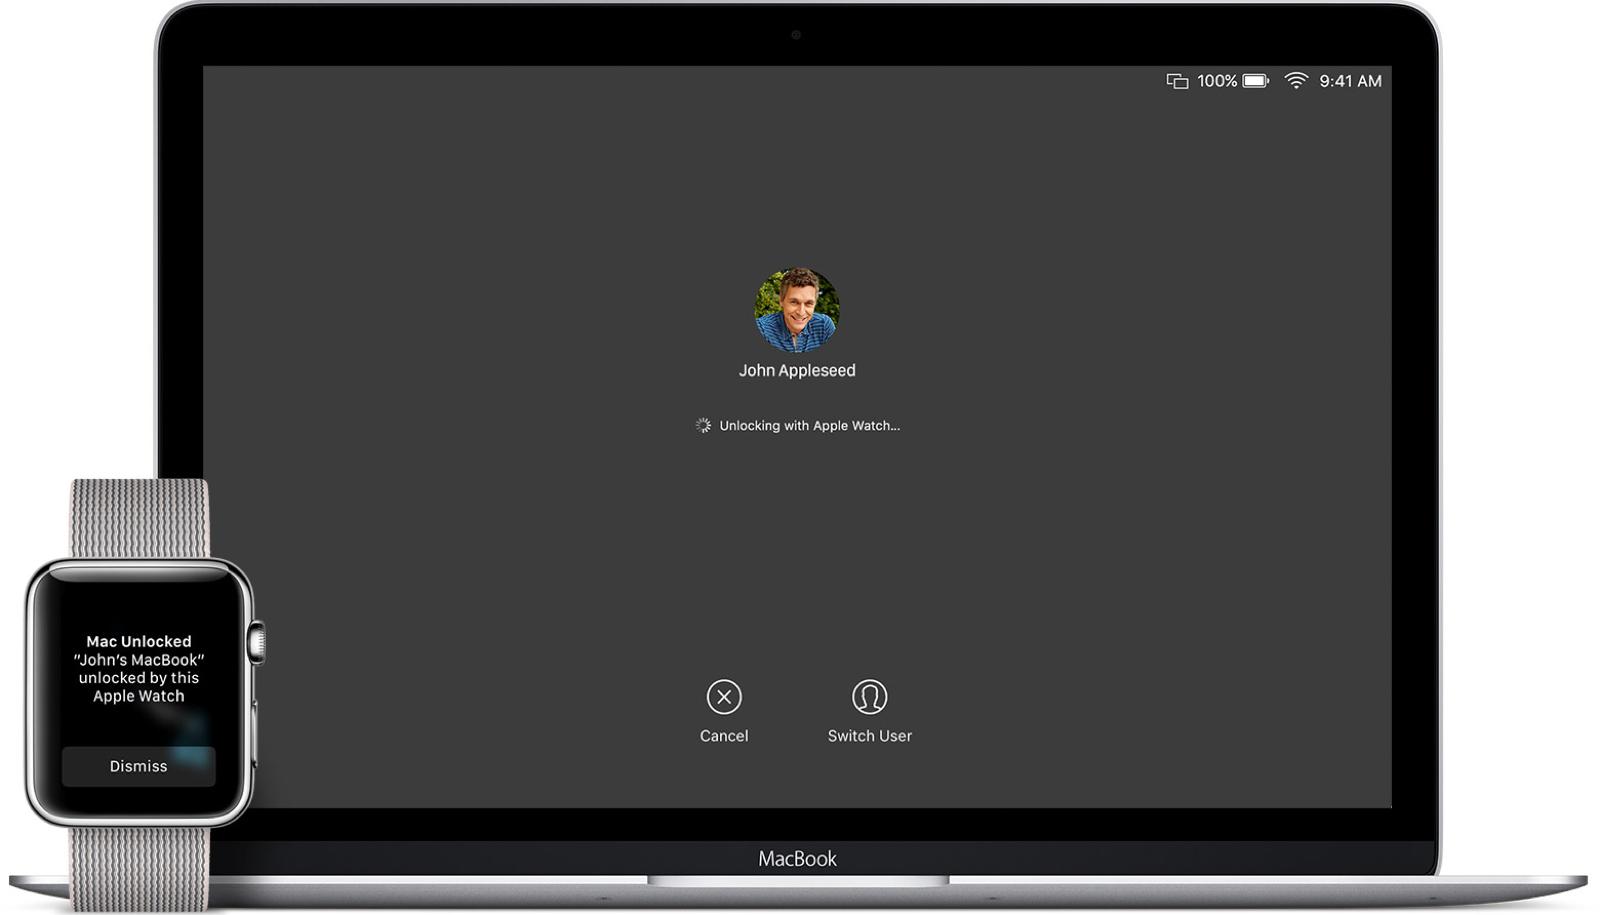 Using Apple Watch auto unlock to unlock a Mac.